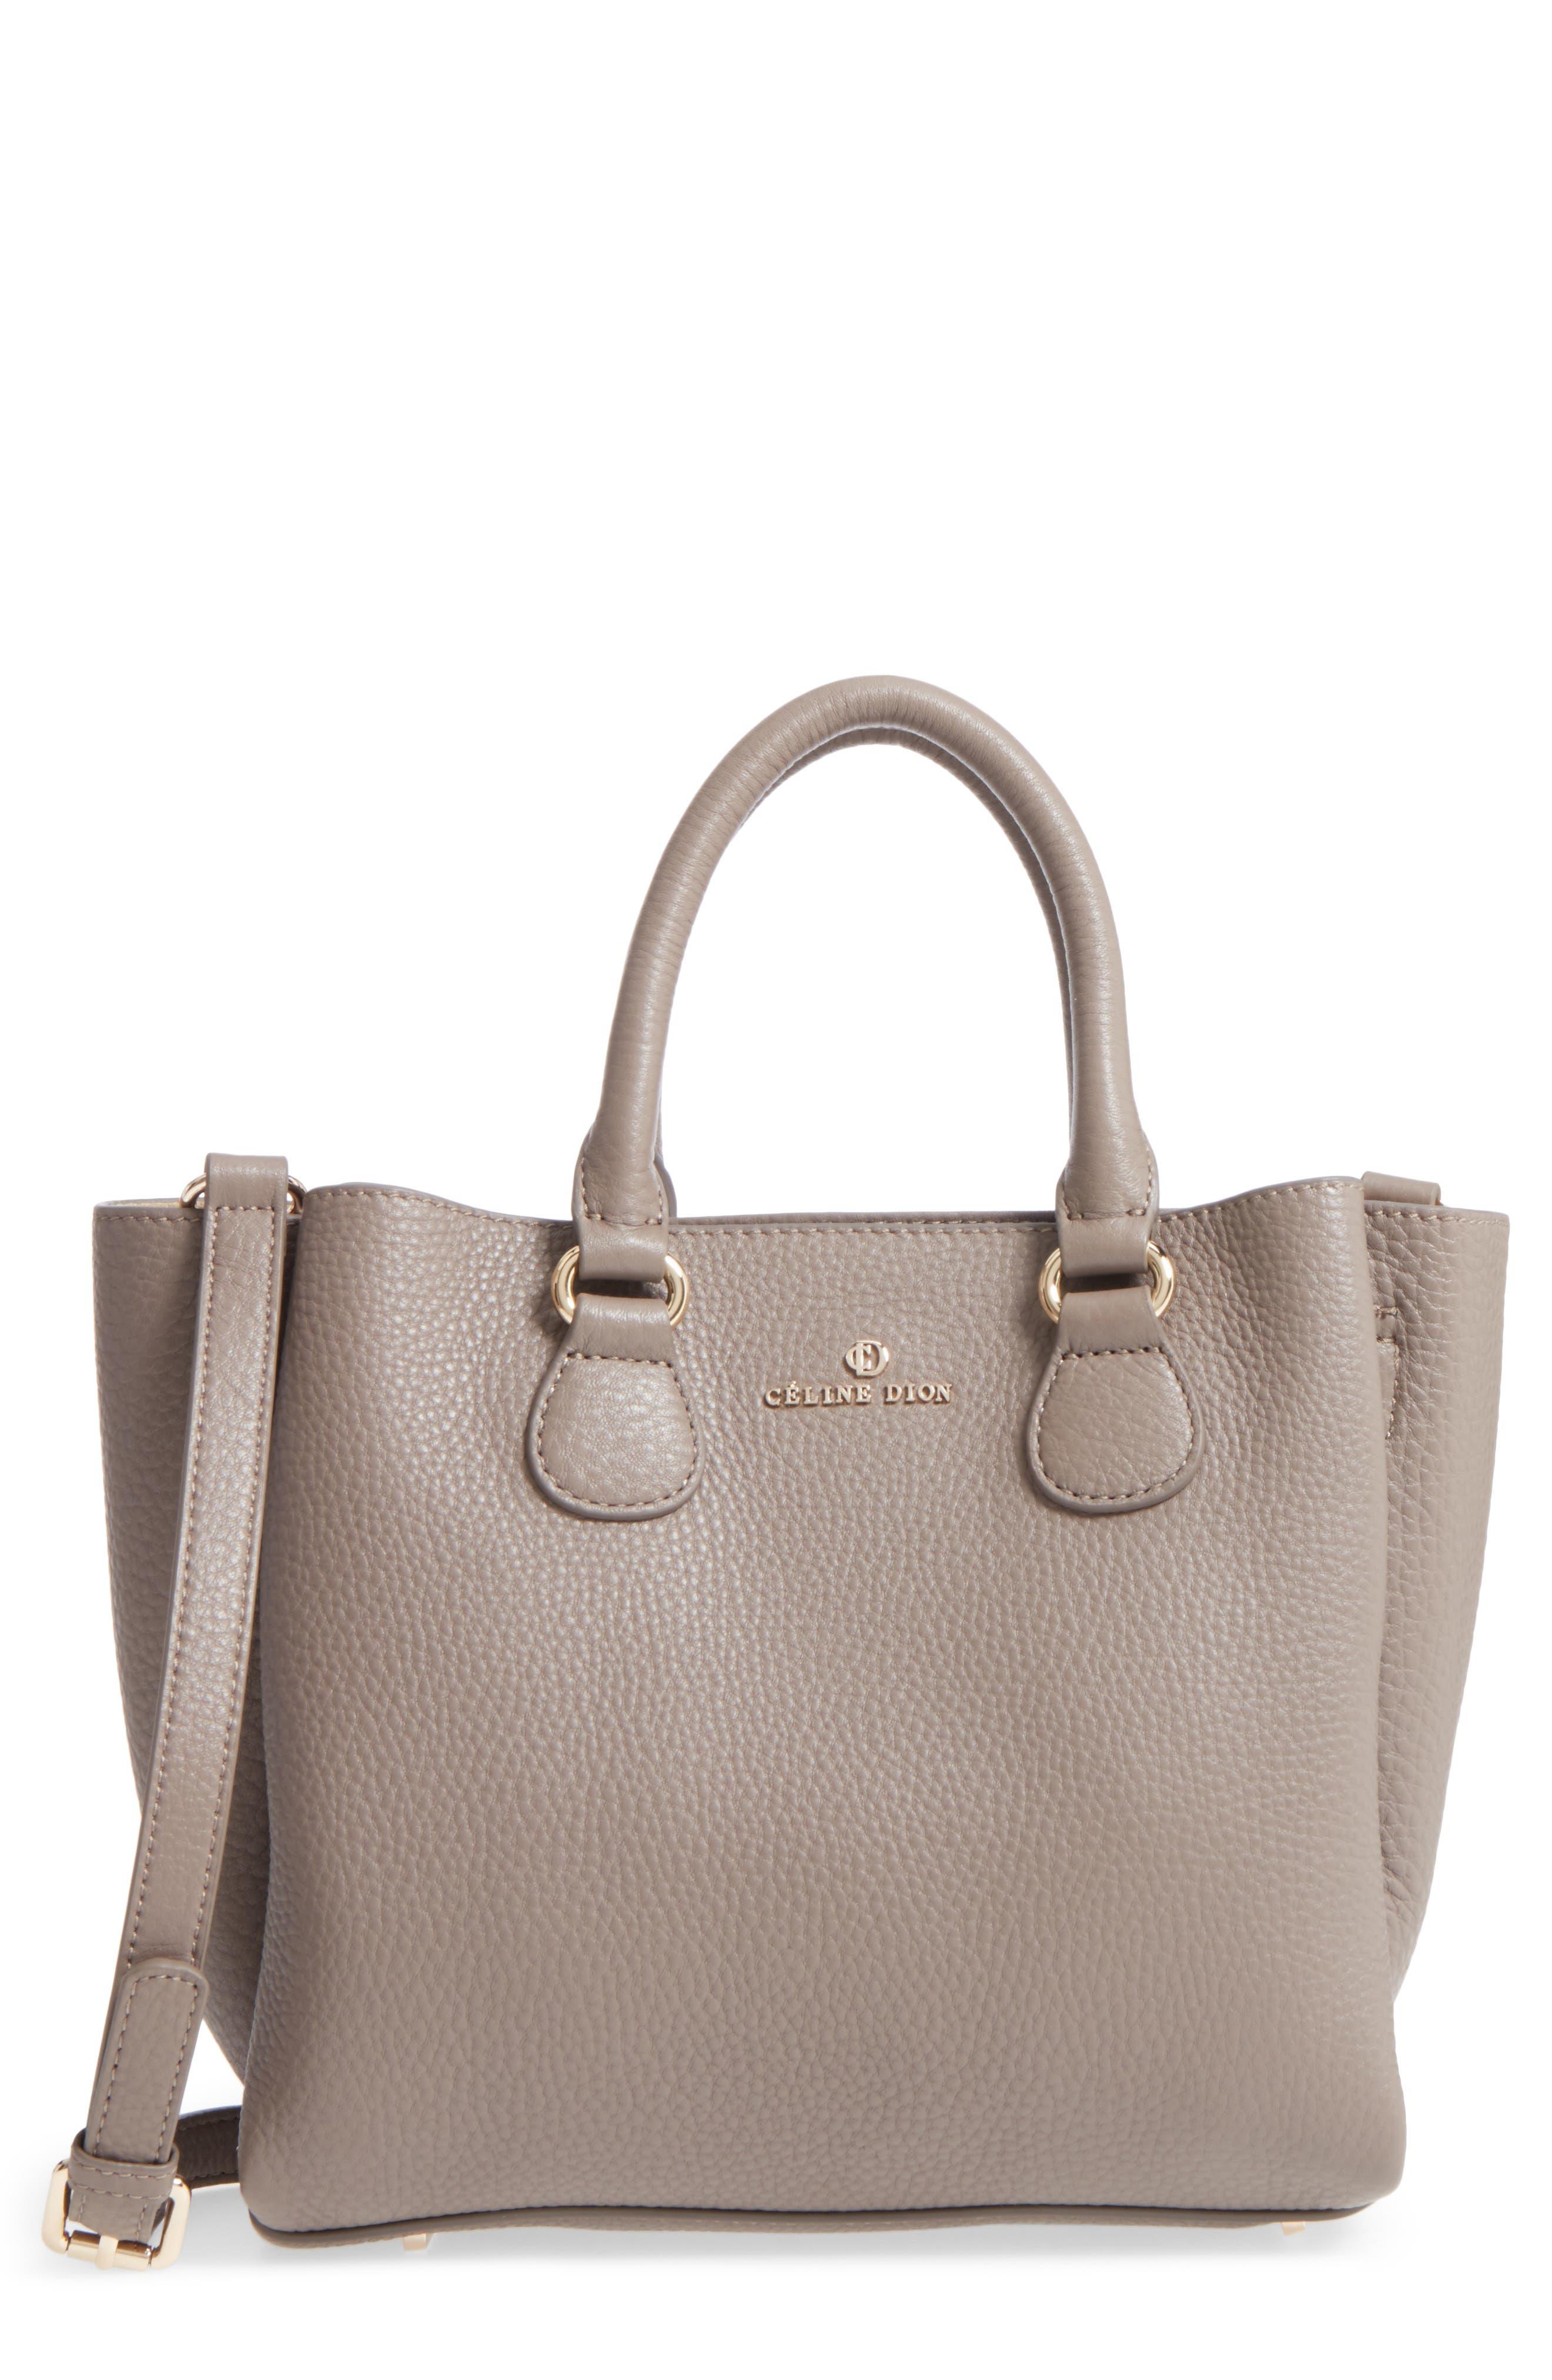 Céline Dion Small Adagio Leather Satchel,                             Main thumbnail 3, color,